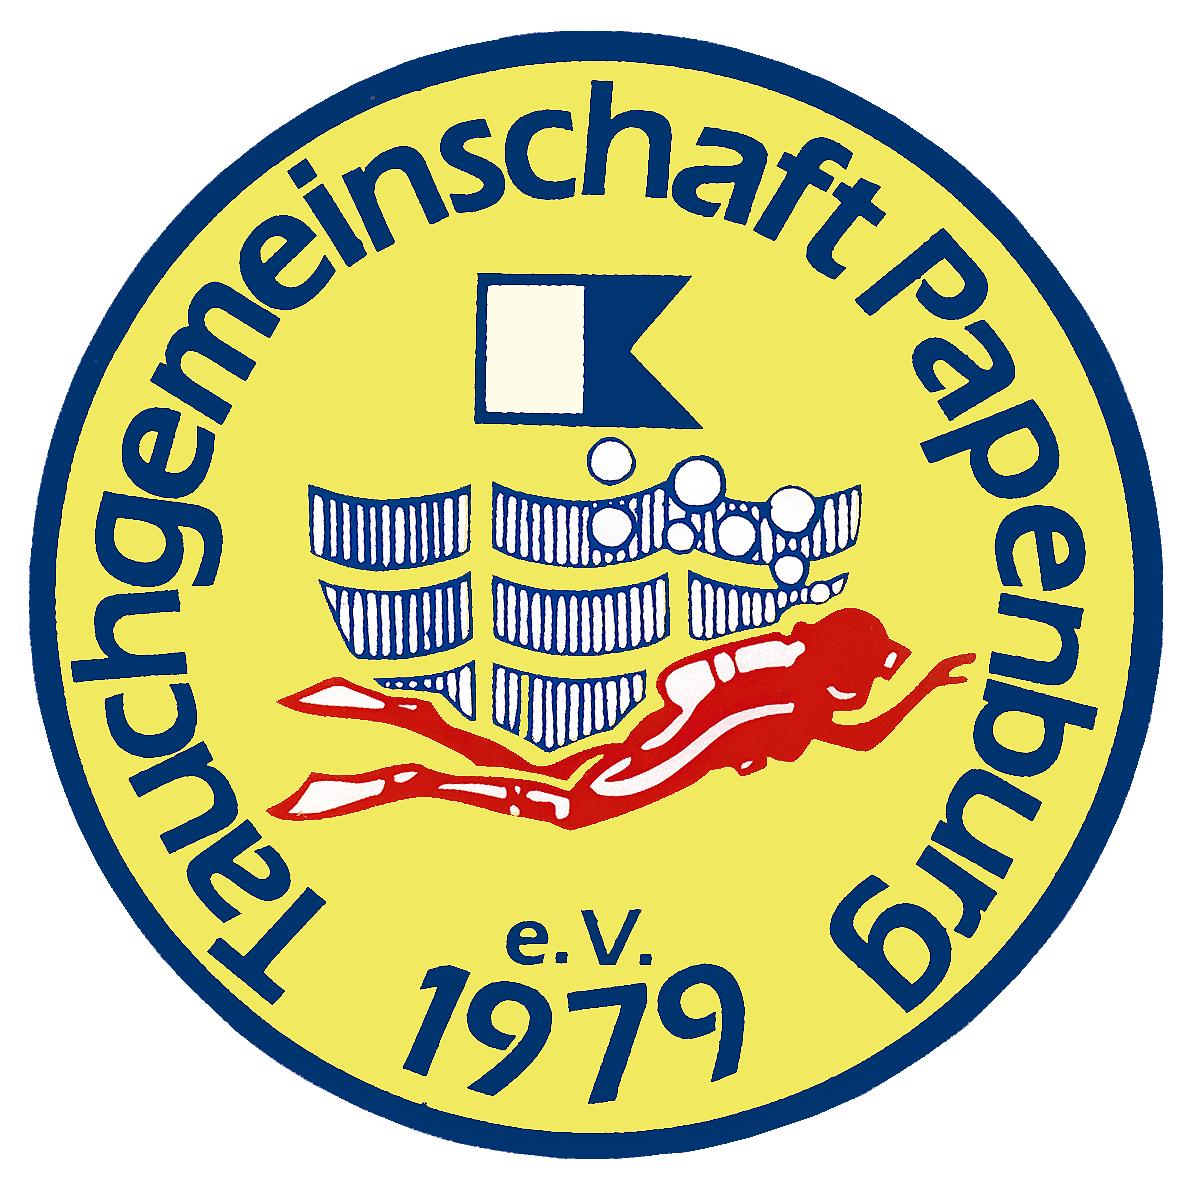 Tauchgemeinschaft Papenburg 1979 e.V.